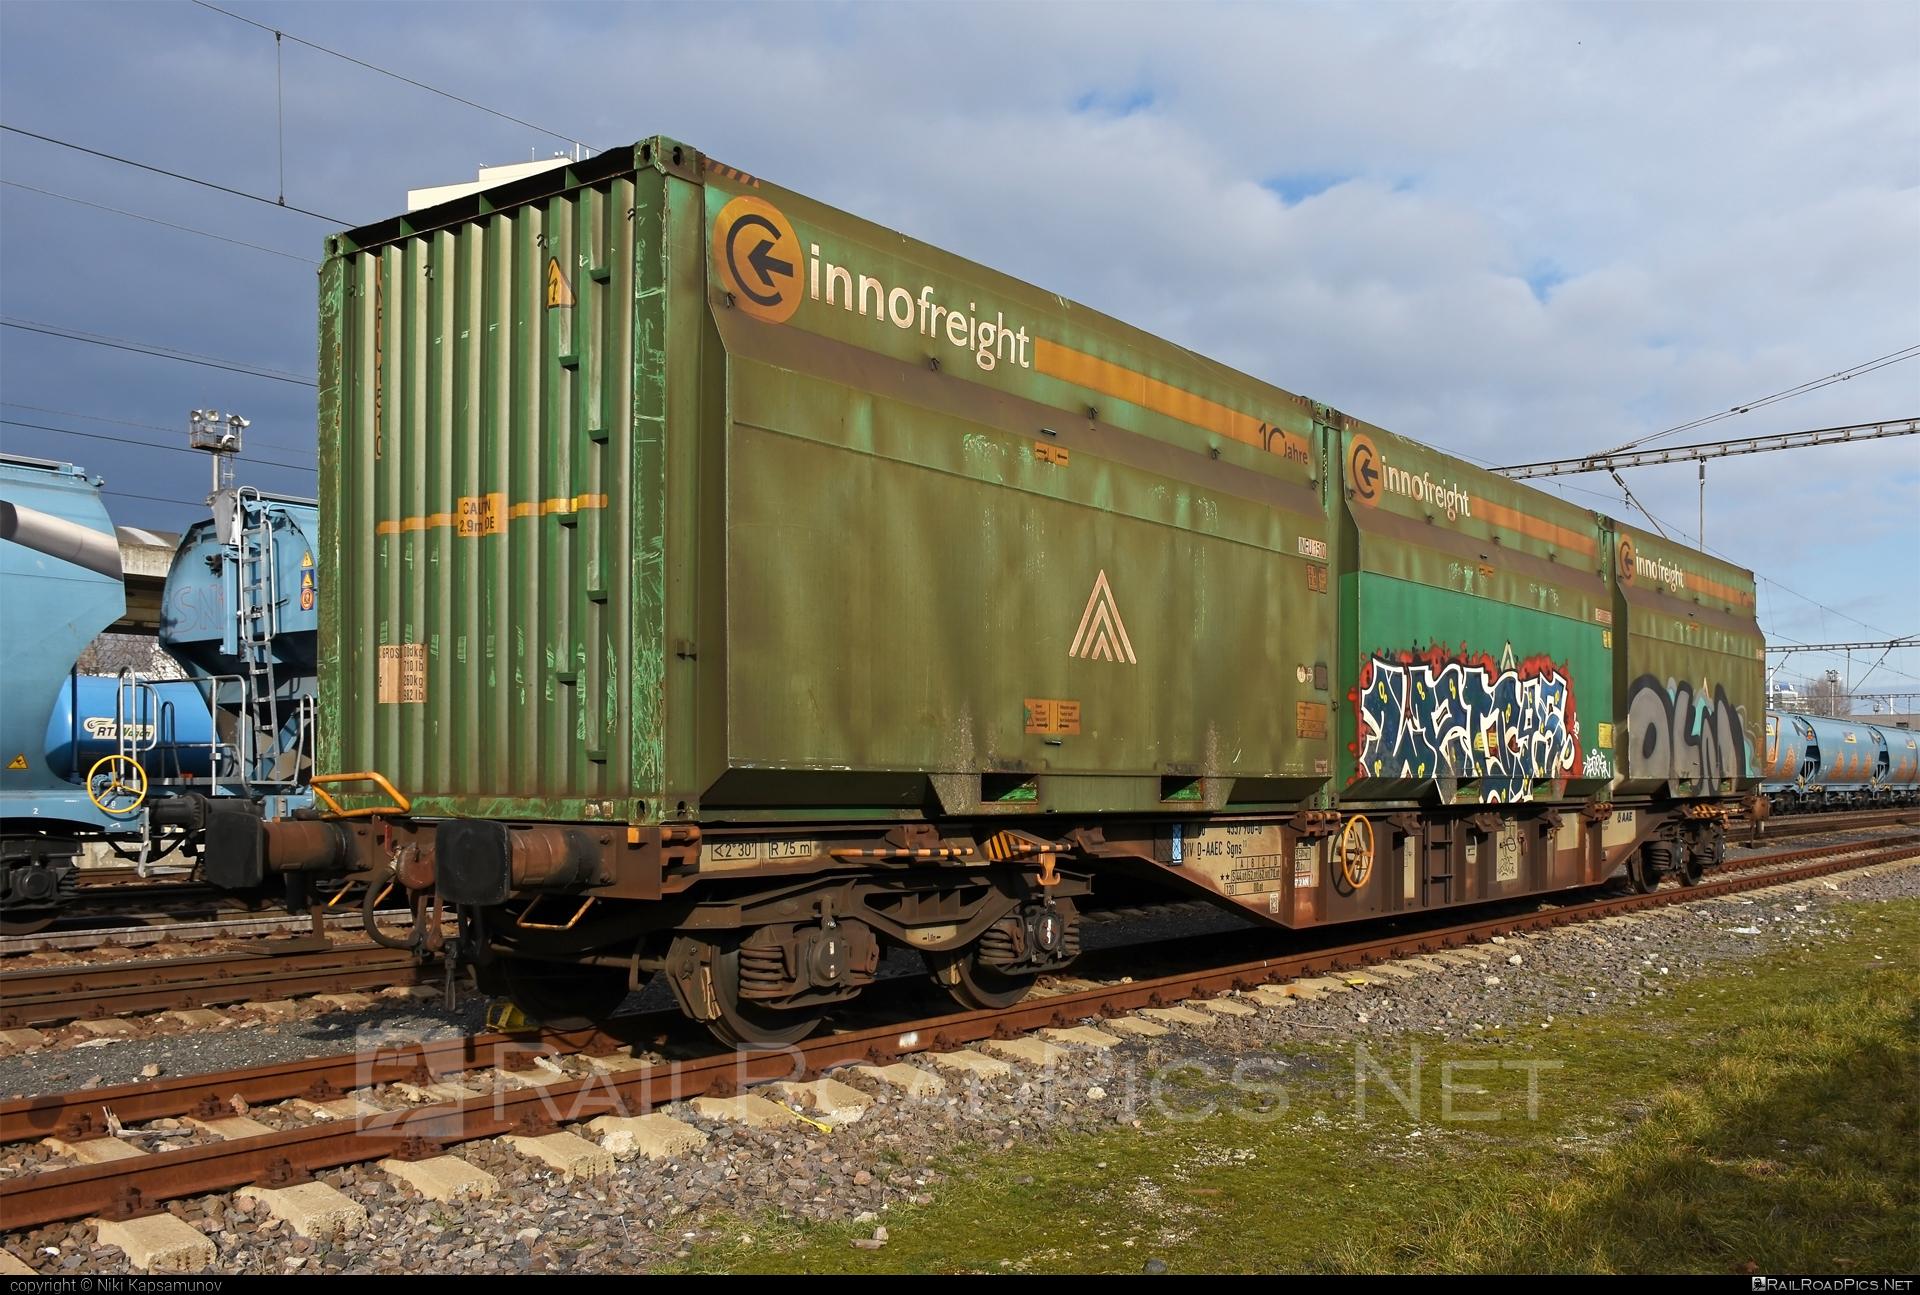 Class S - Sgns - 47 80 4557 900-0 D-AAEC operated by VTG Schweiz GmbH #container #flatwagon #innofreight #sgns #vtg #vtgschweiz